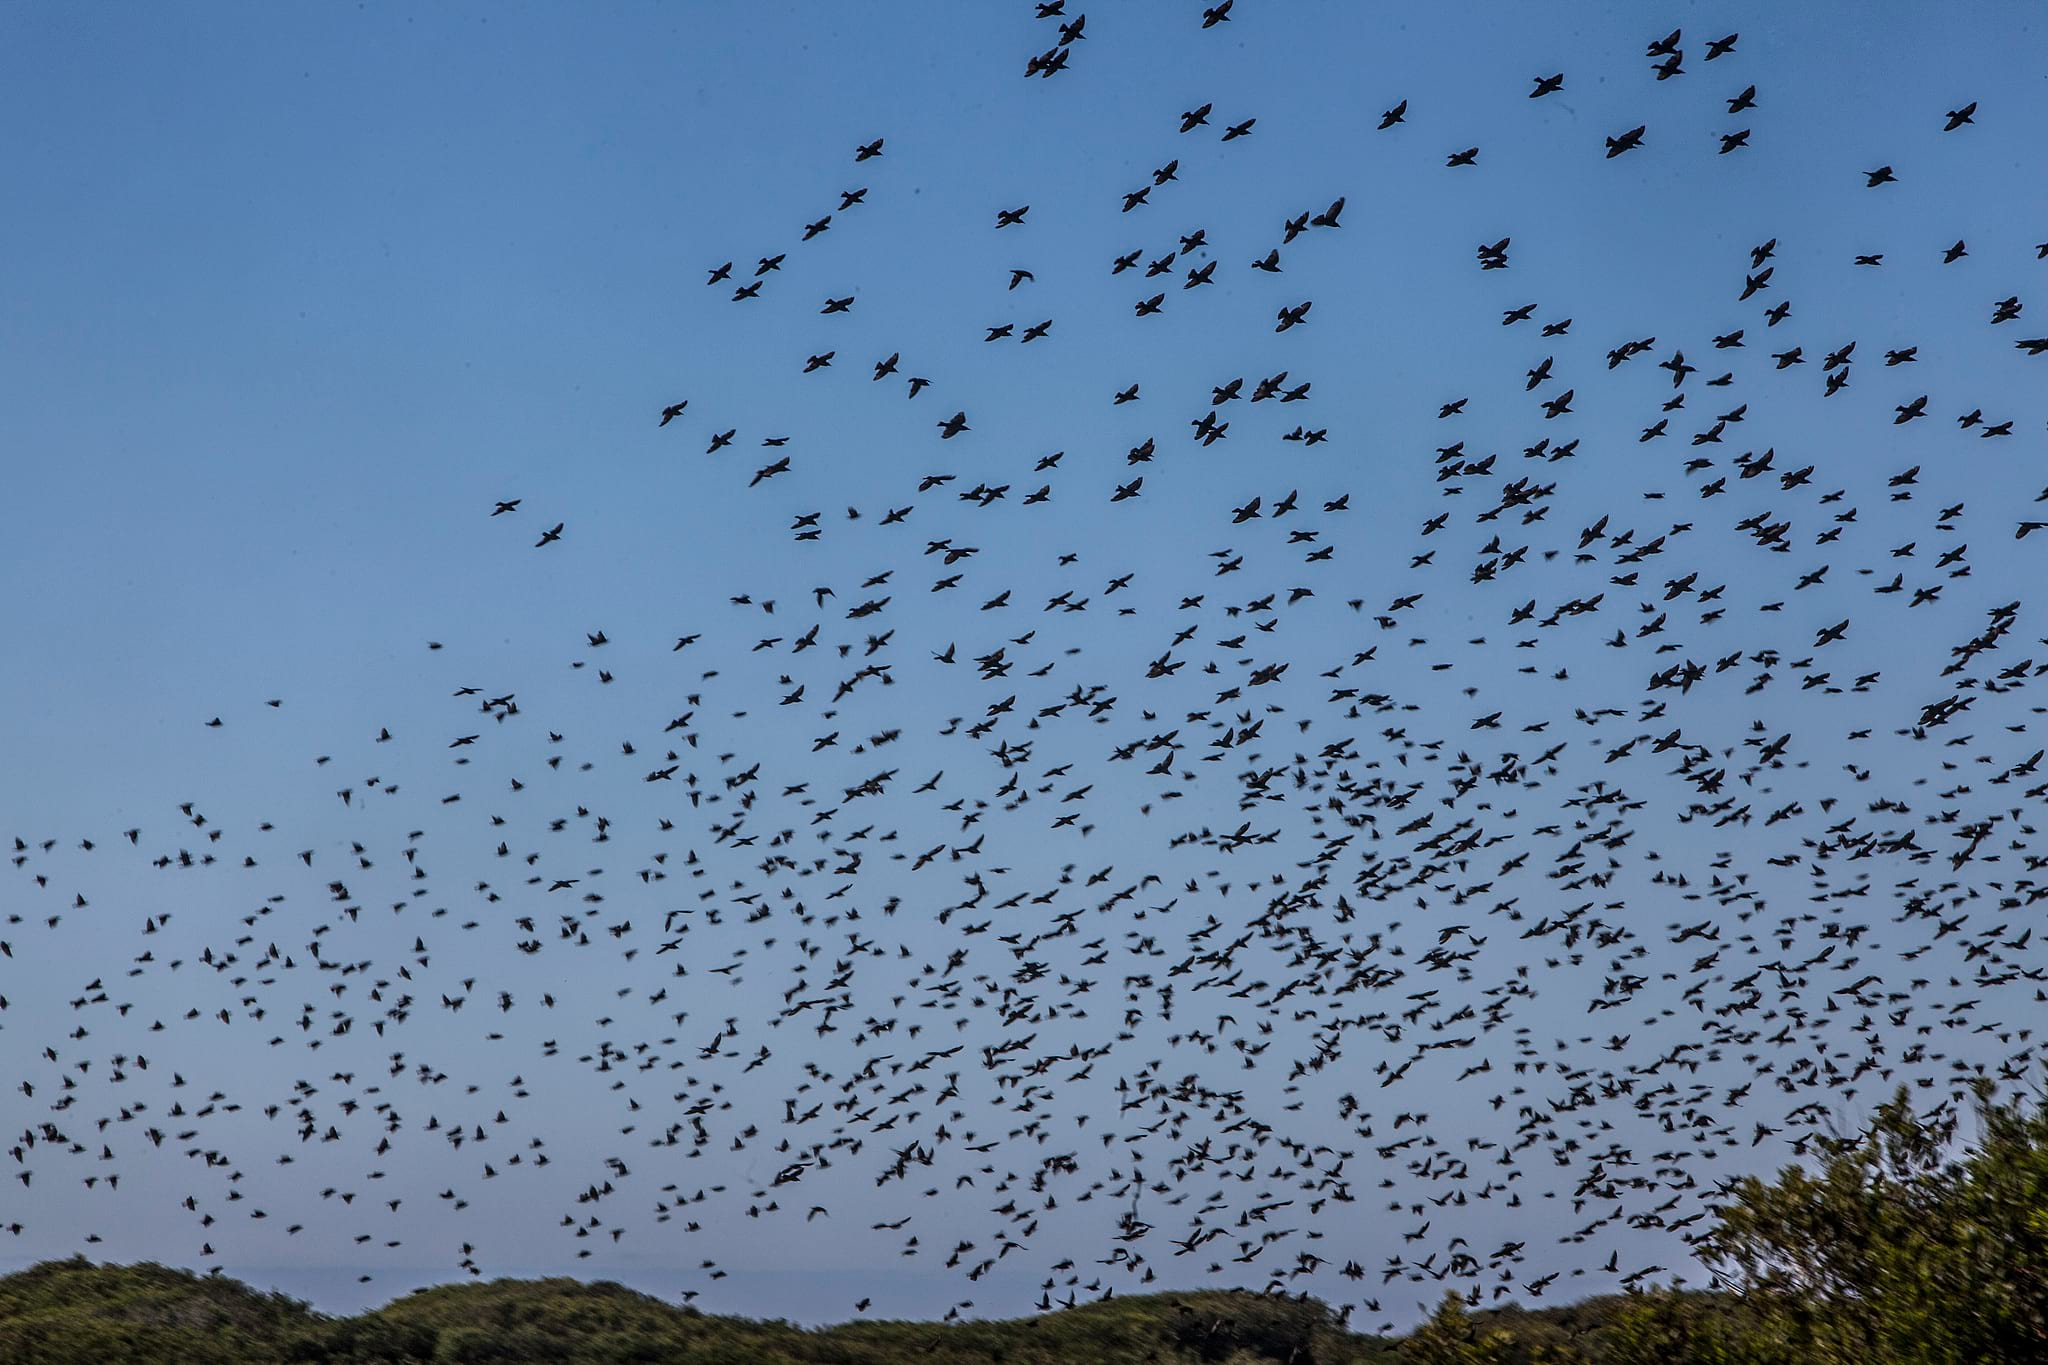 PÚBLICO - Deixe os binóculos por perto. É tempo de observar para onde migram as aves